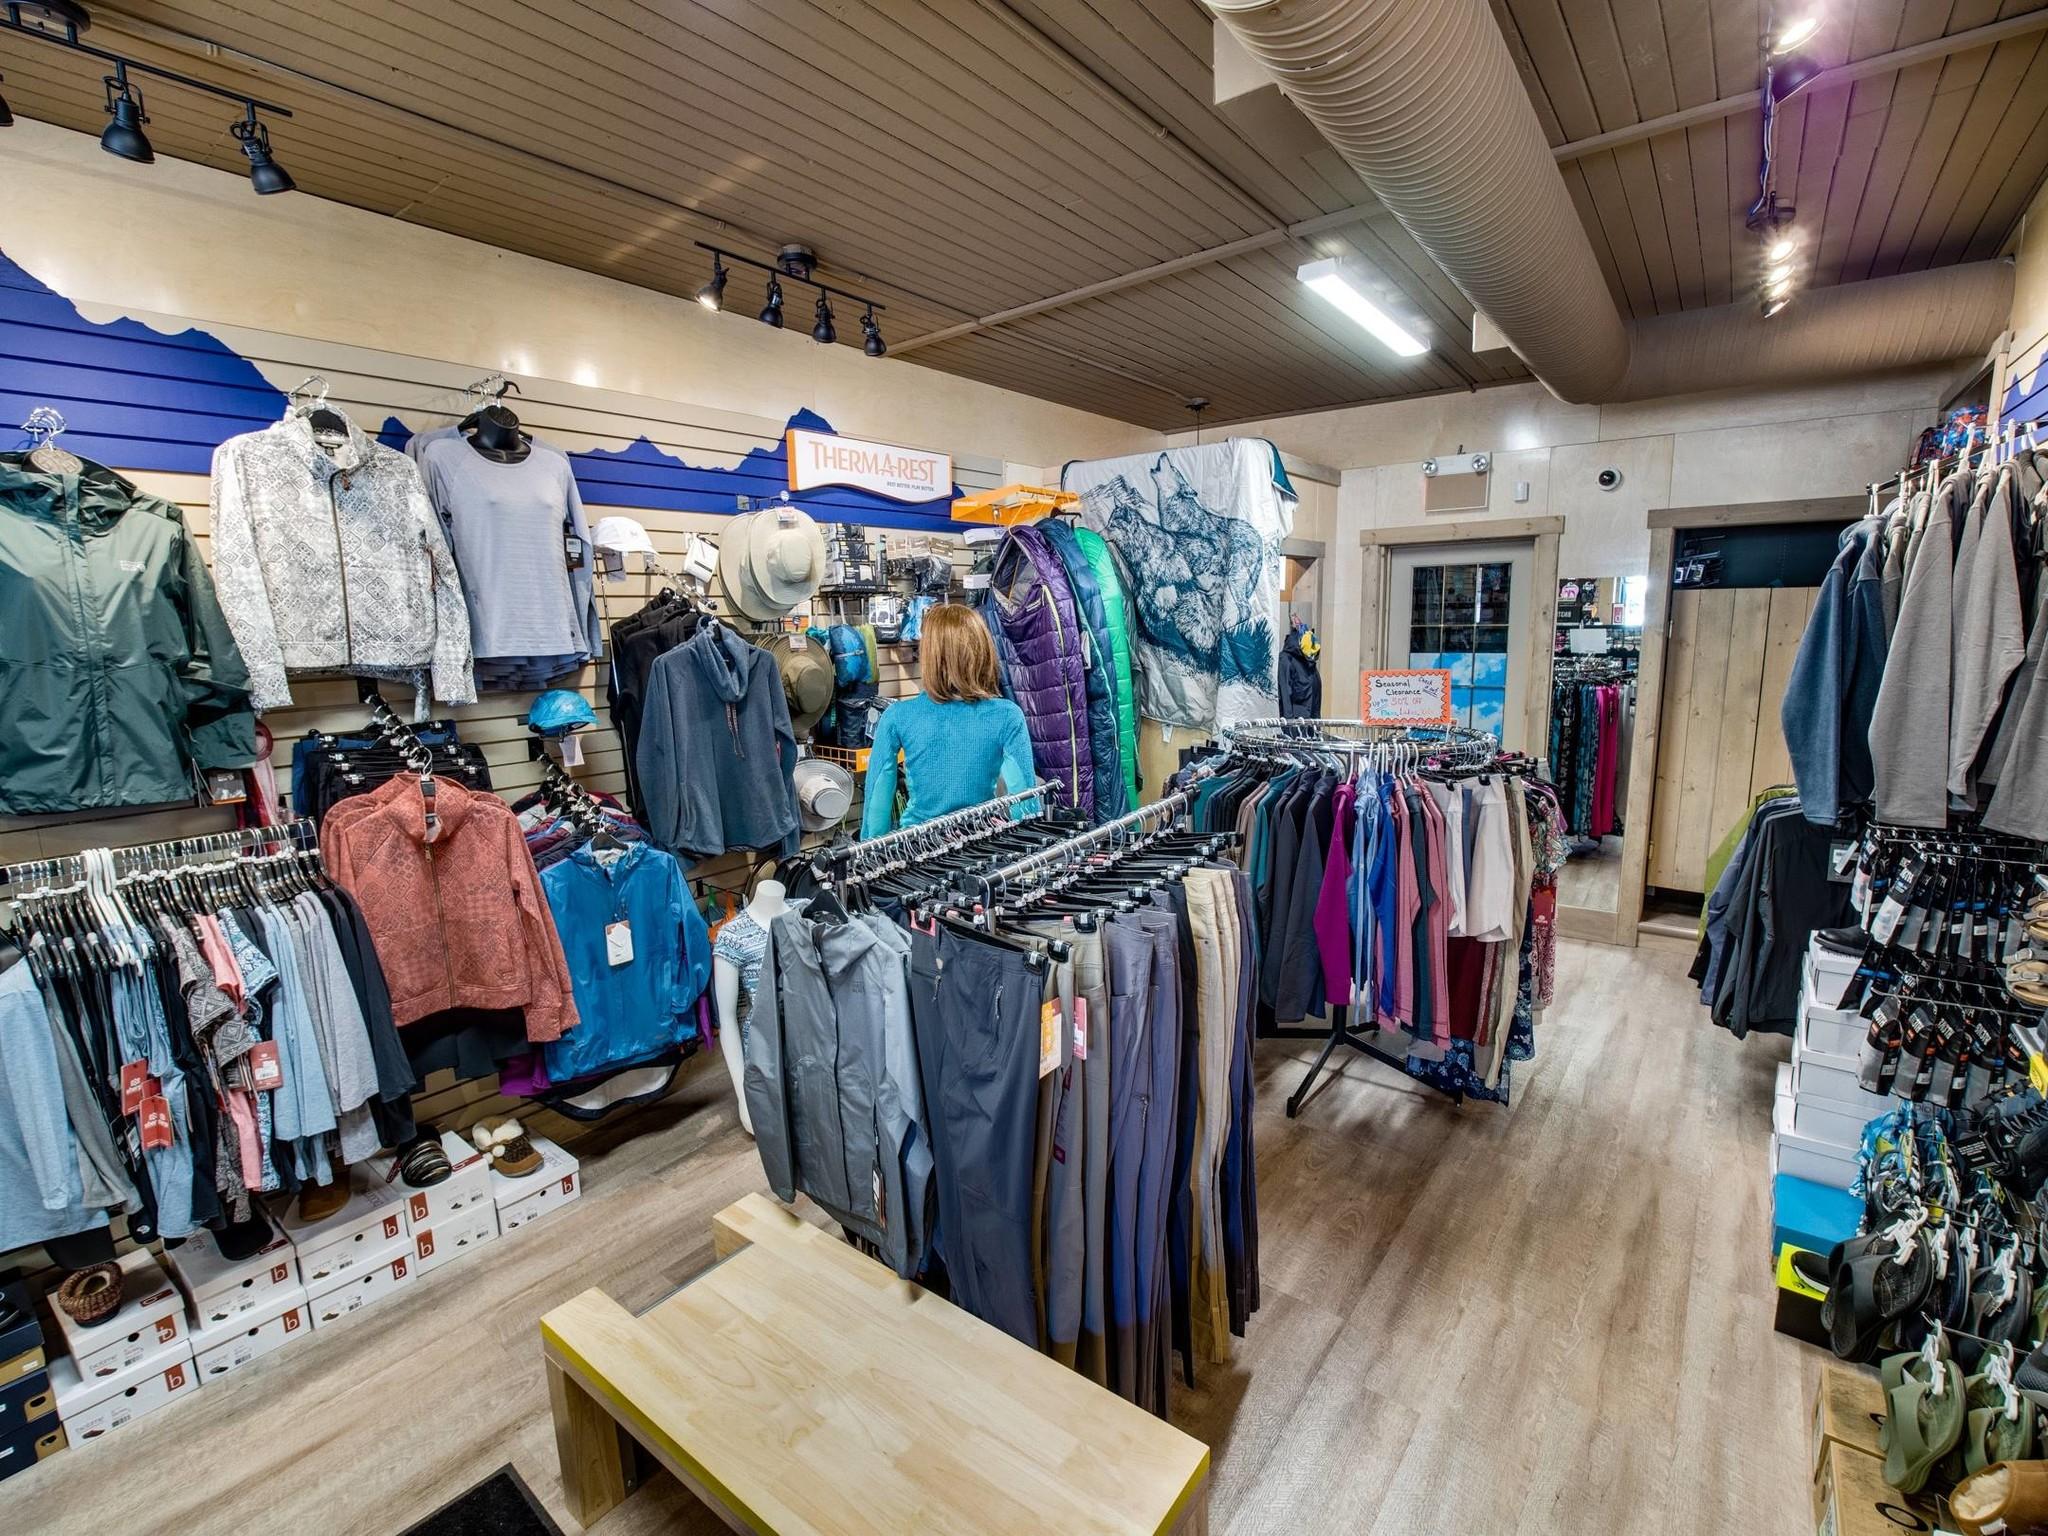 Monashee Outdoors clothes